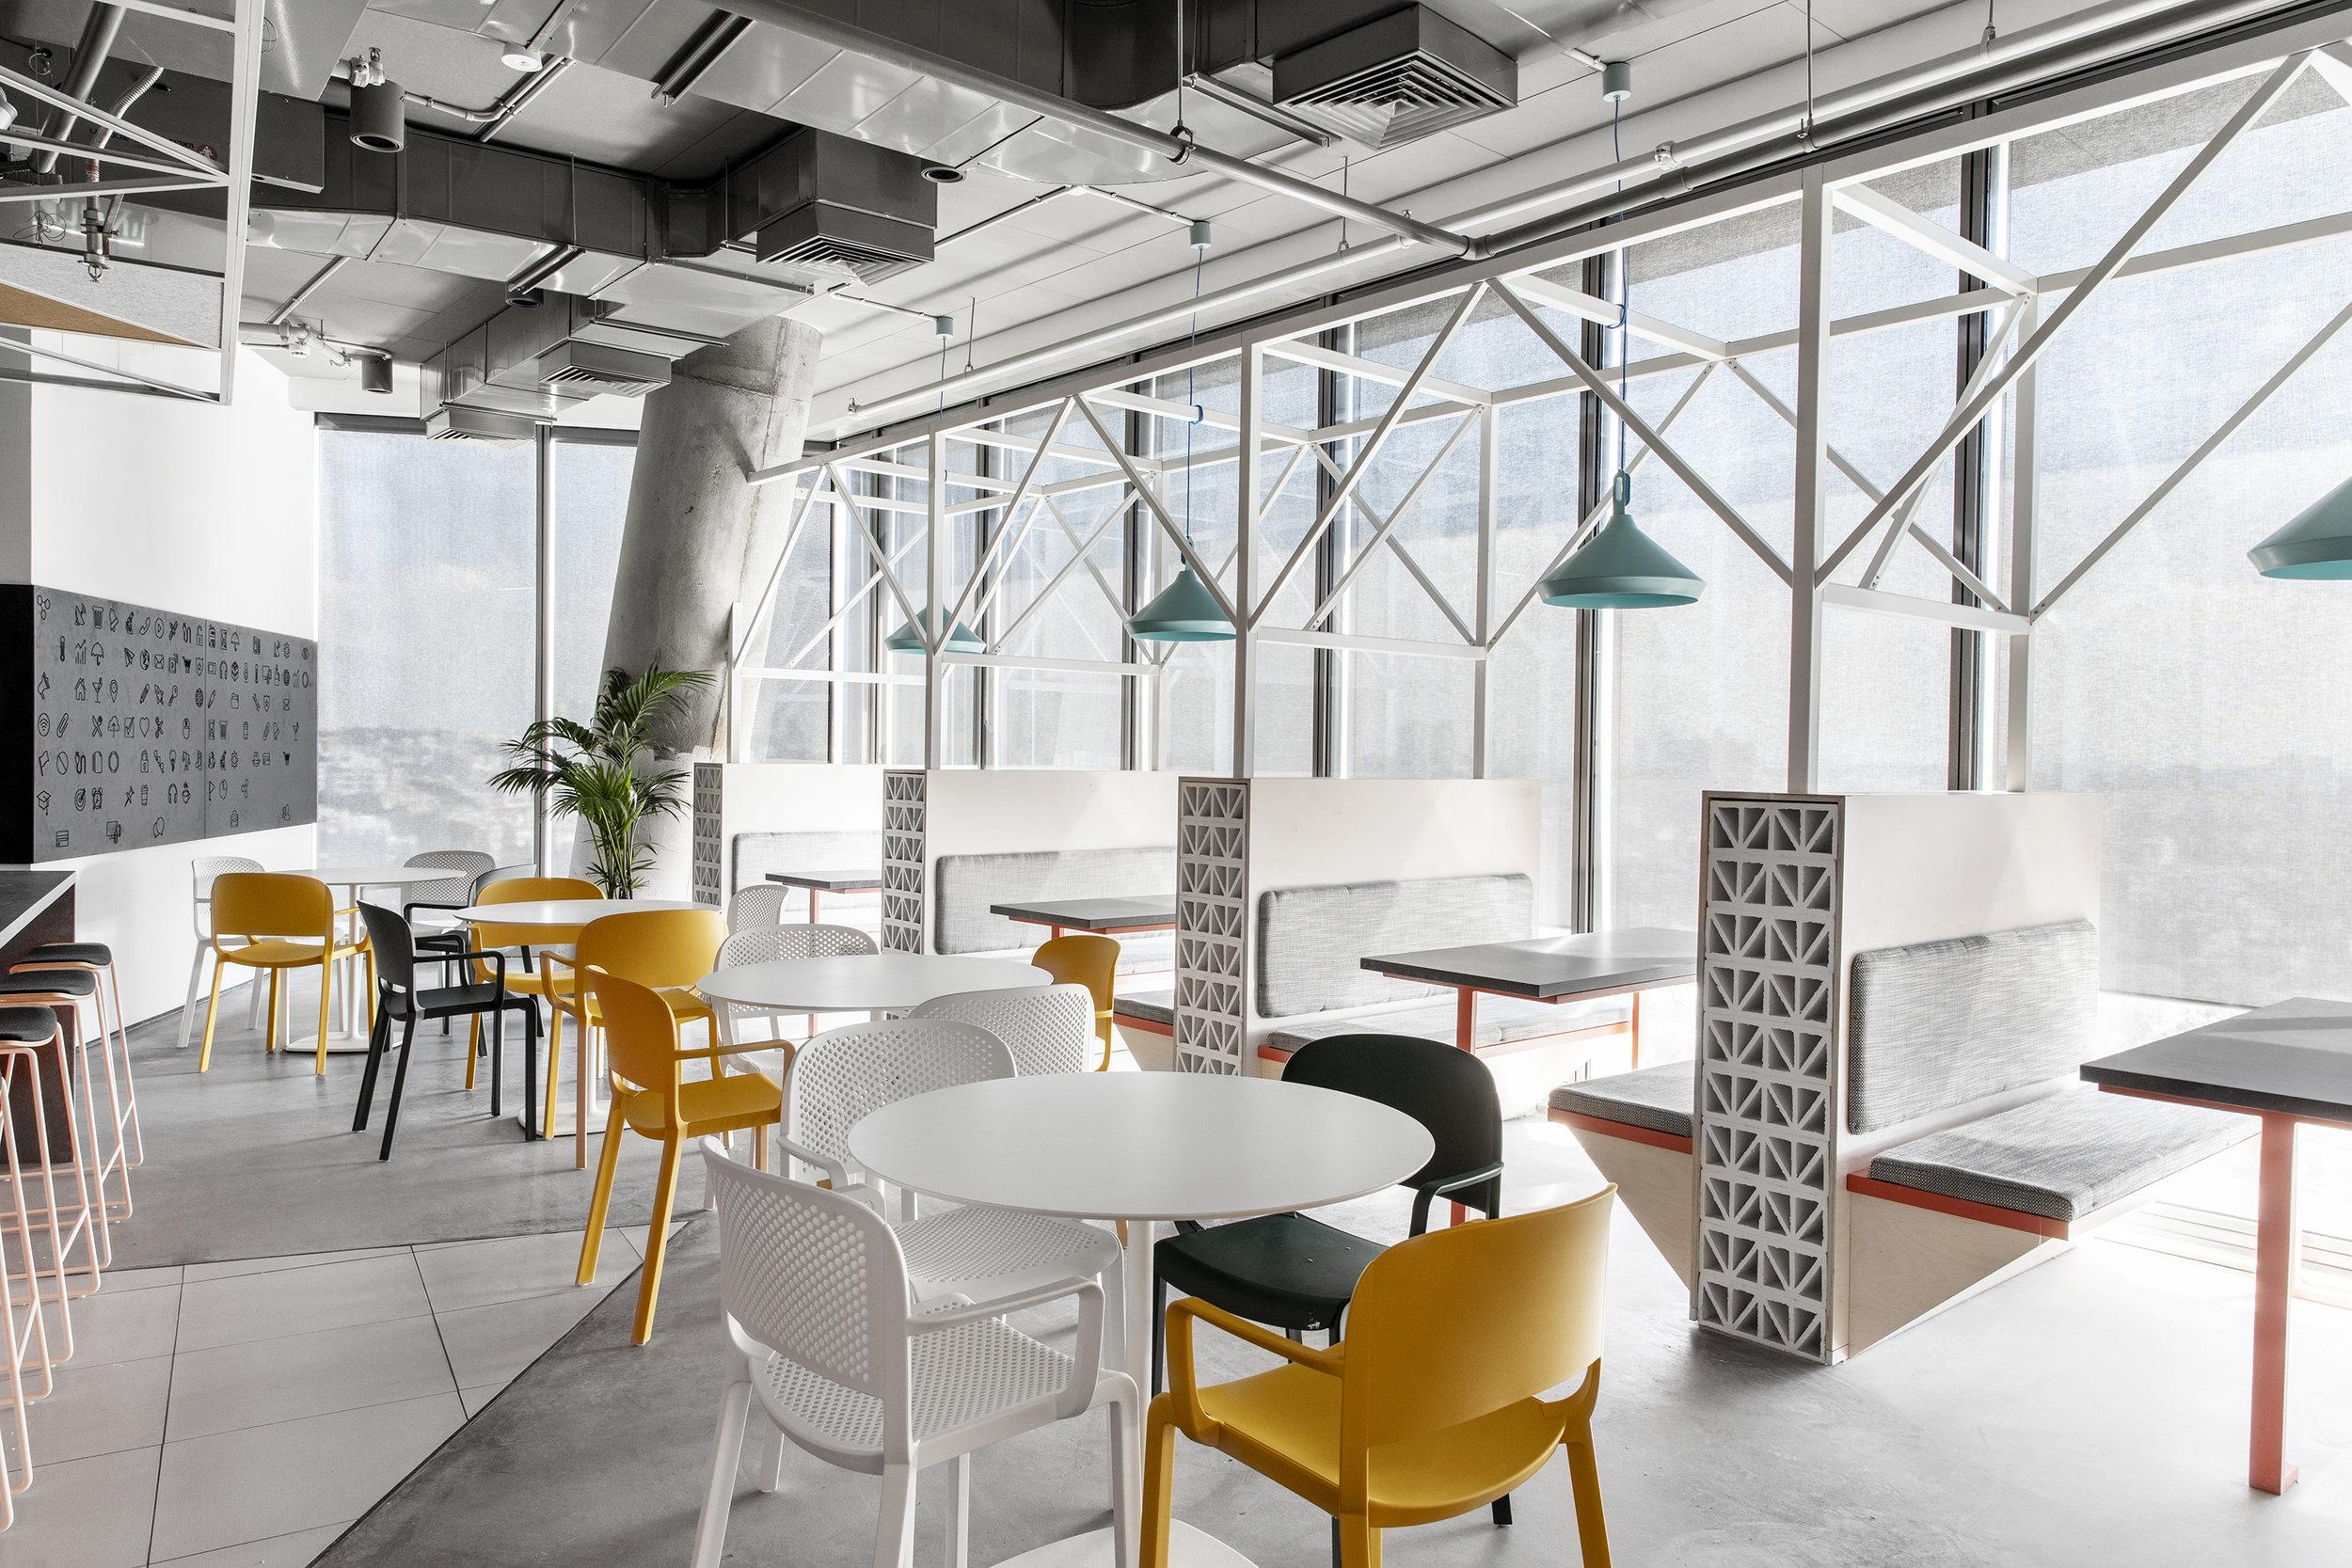 AKAMAI - ROY DAVID ARCHITECTURE - STUDIO - רואי דוד אדריכלות - אדריכלים - סטודיו - אקמאי (10).jpg